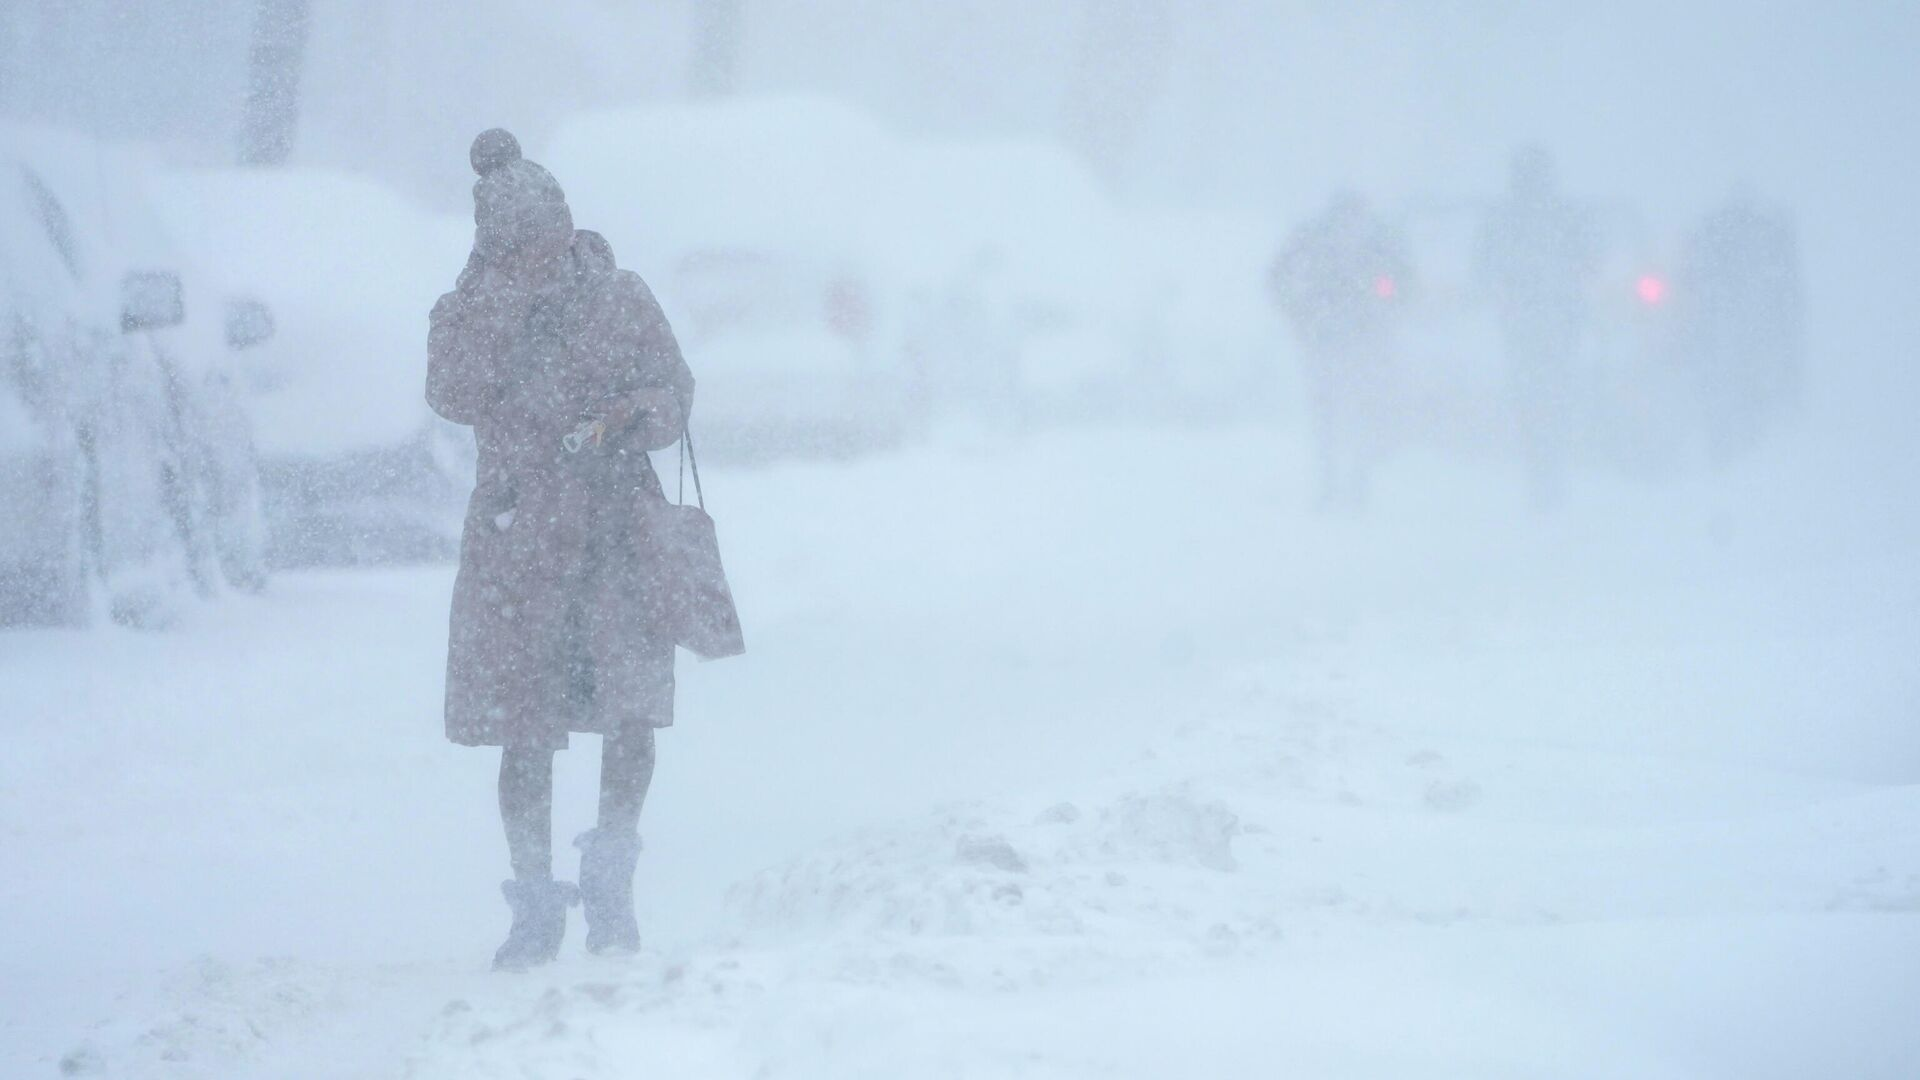 Женщина во время снегопада в Джерси-Сити - РИА Новости, 1920, 15.03.2021